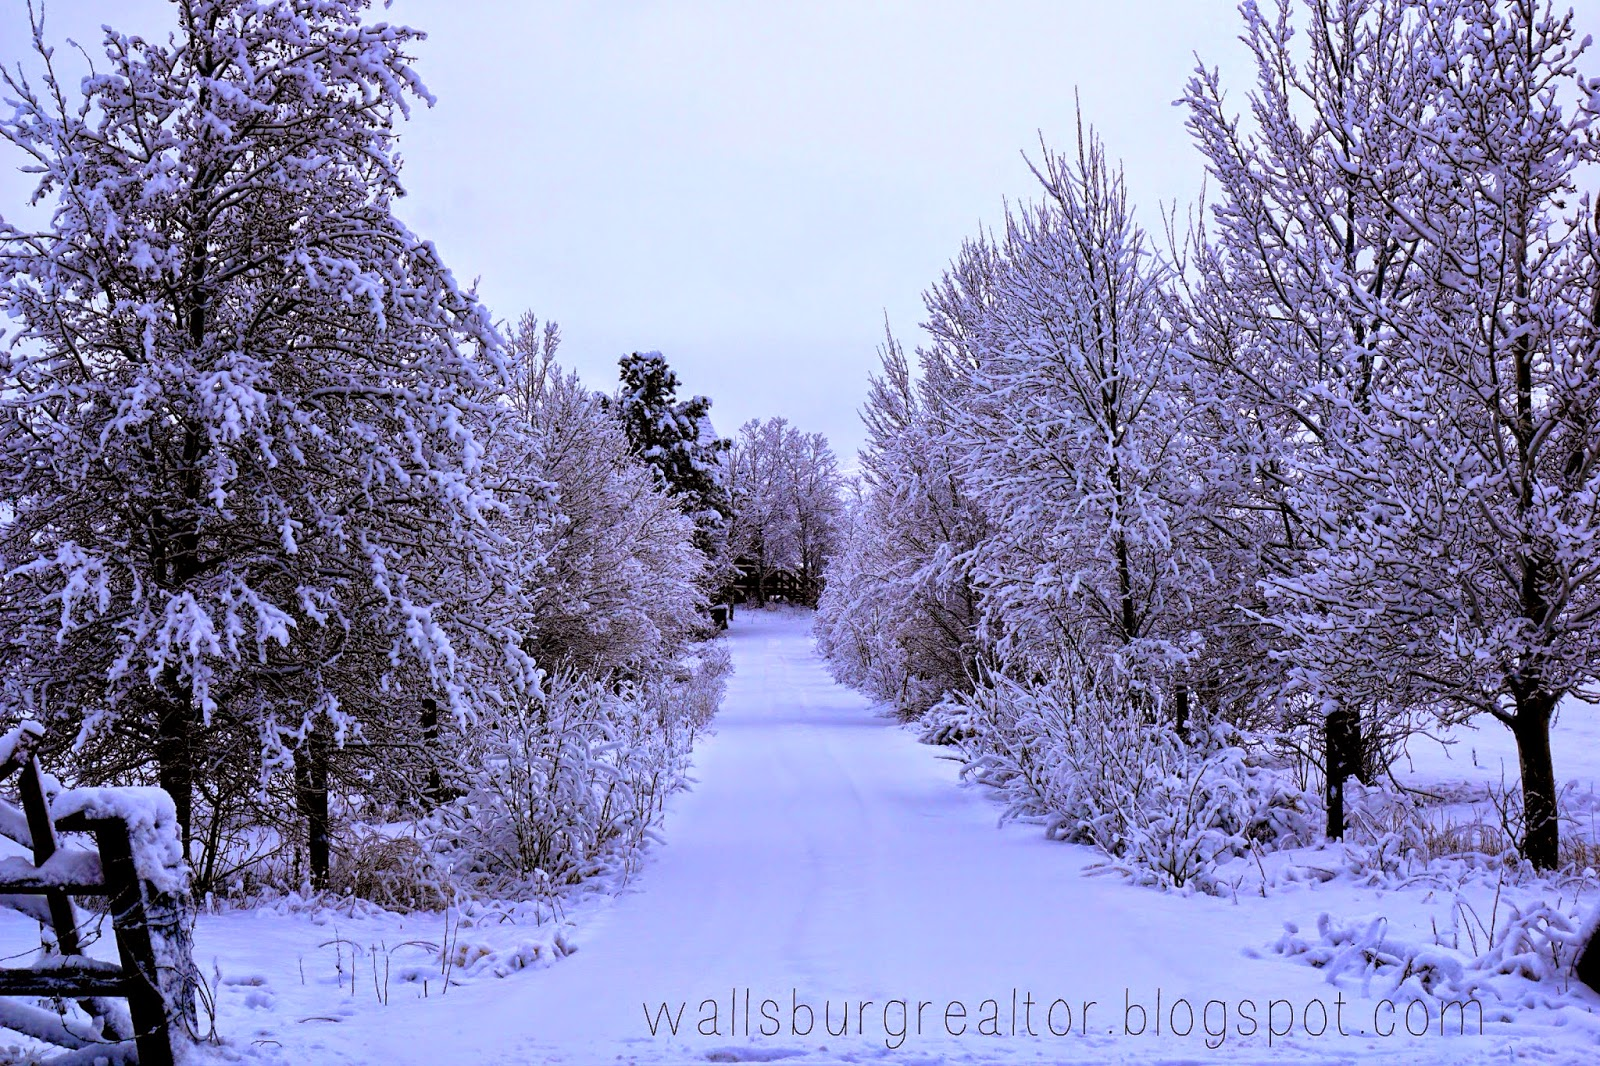 Winter in Wallsburg